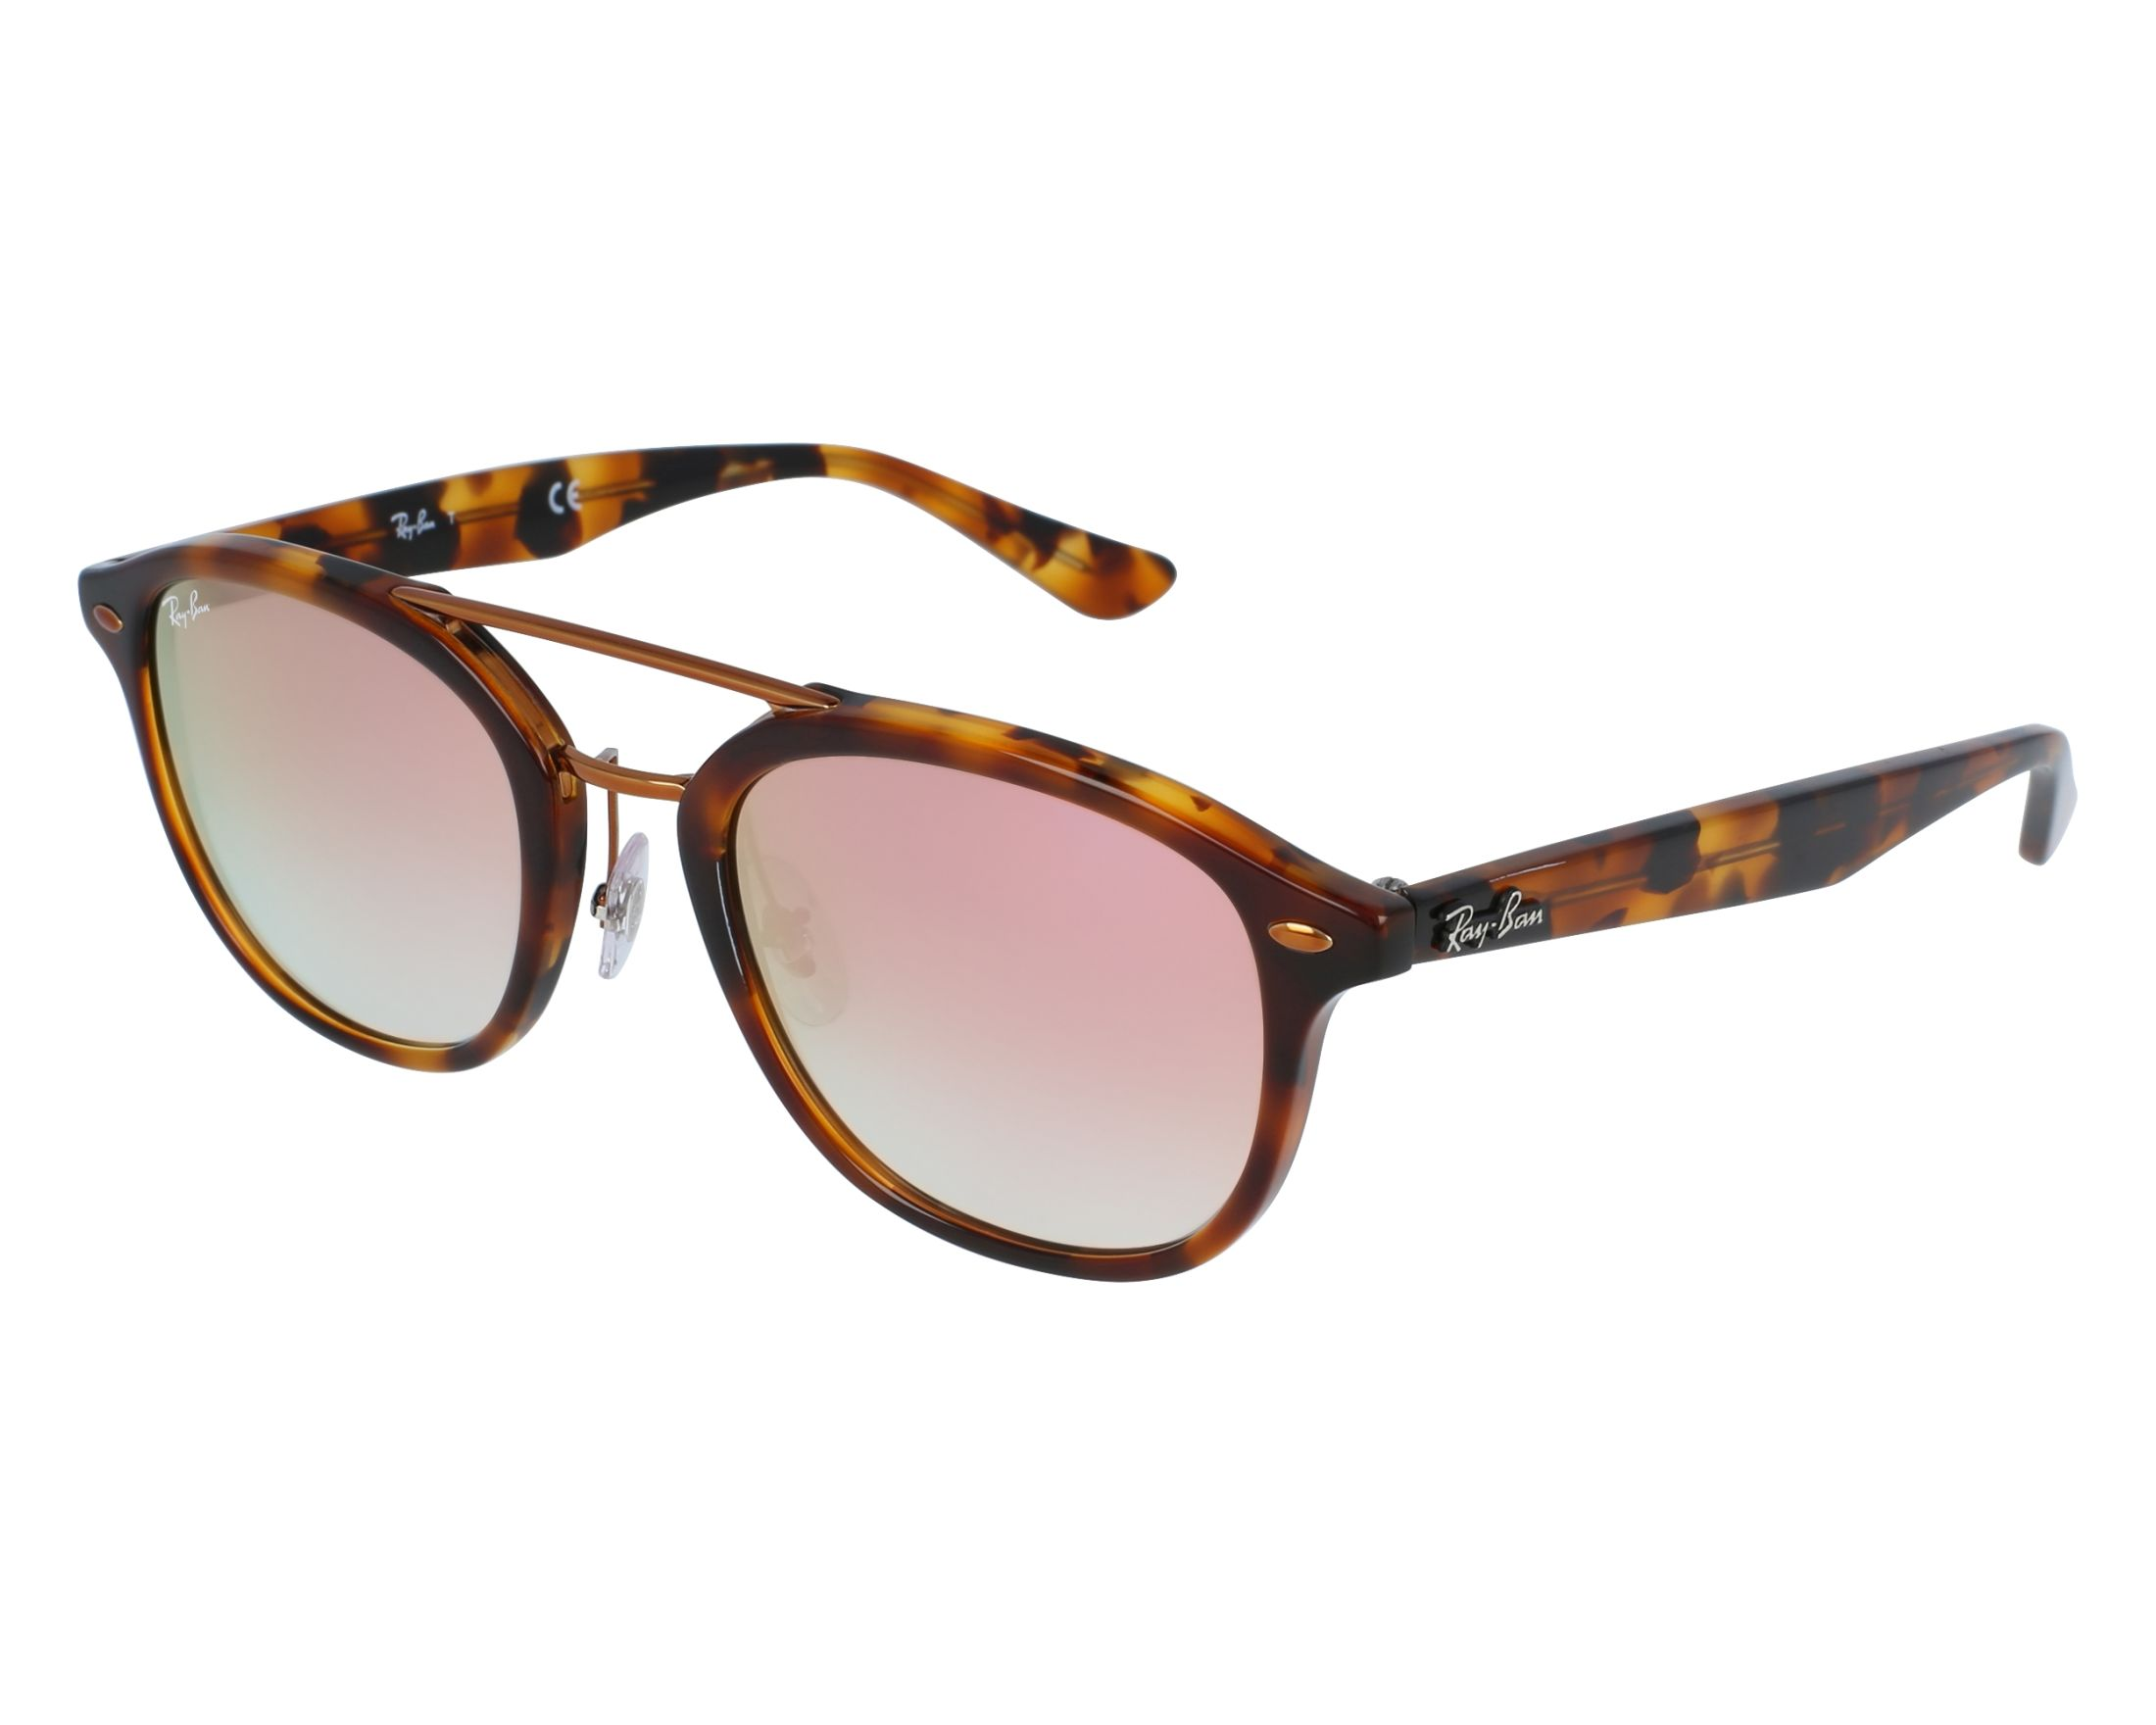 9f1329c5ad Sunglasses Ray-Ban RB-2183 1127B9 53-21 Havana Copper front view